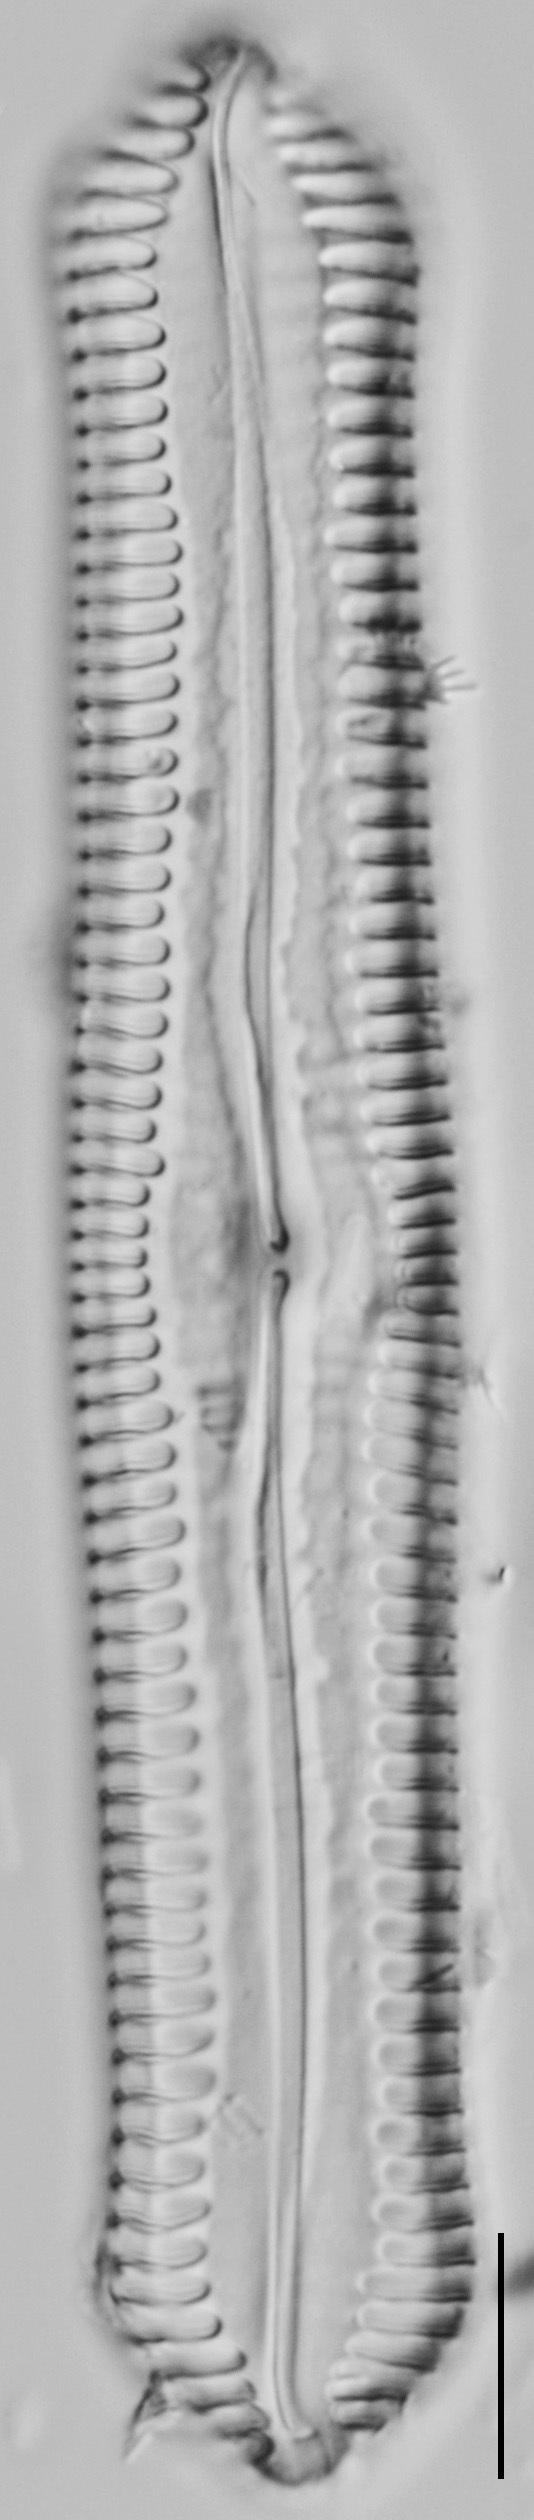 Pinnularia cuneicephala LM8